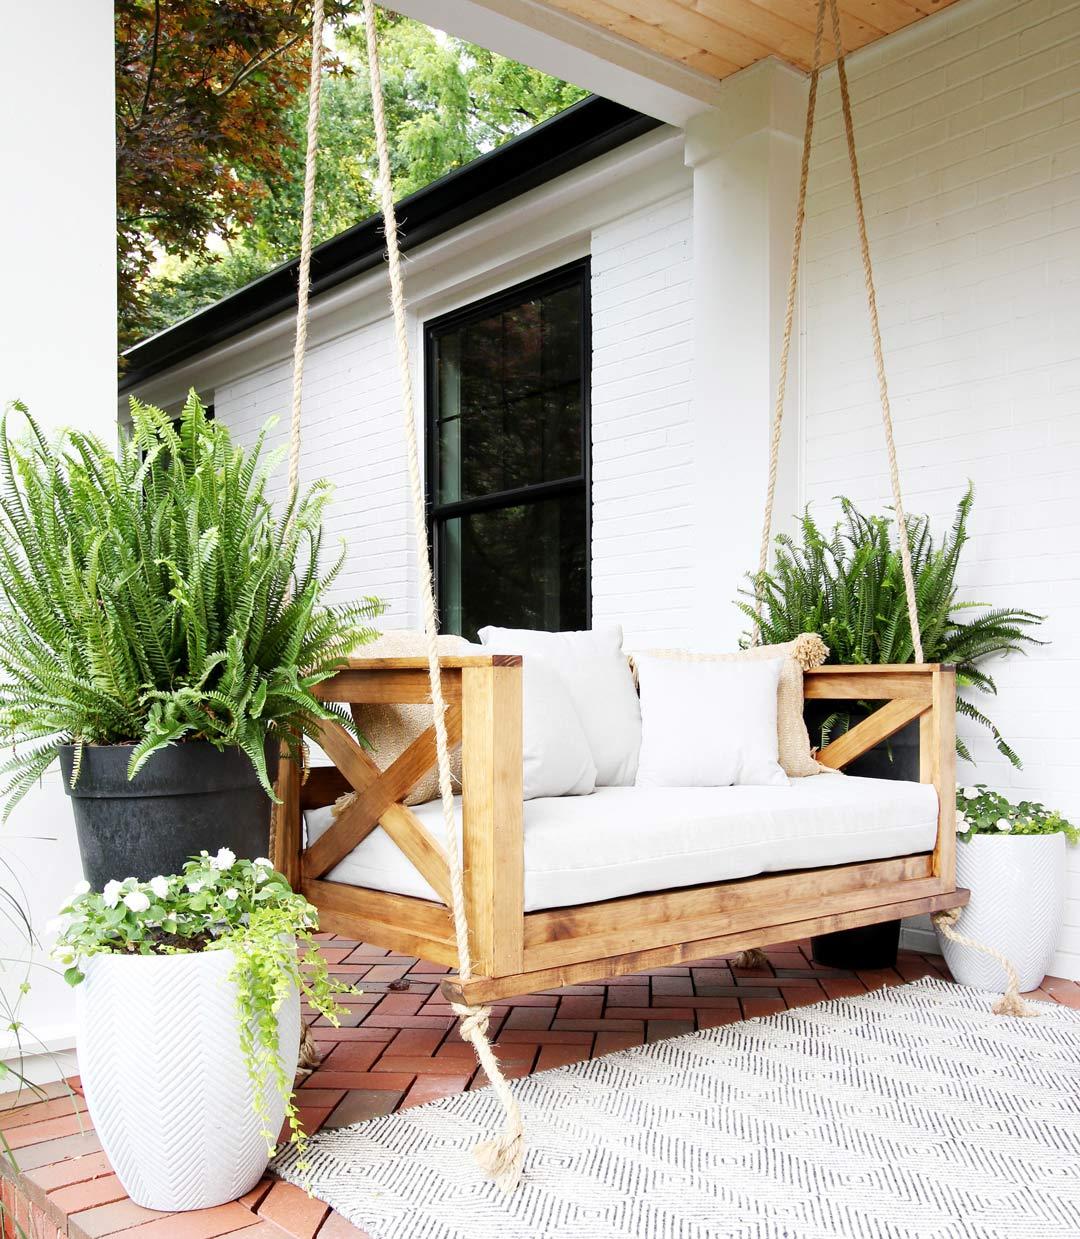 to build a crib mattress porch swing